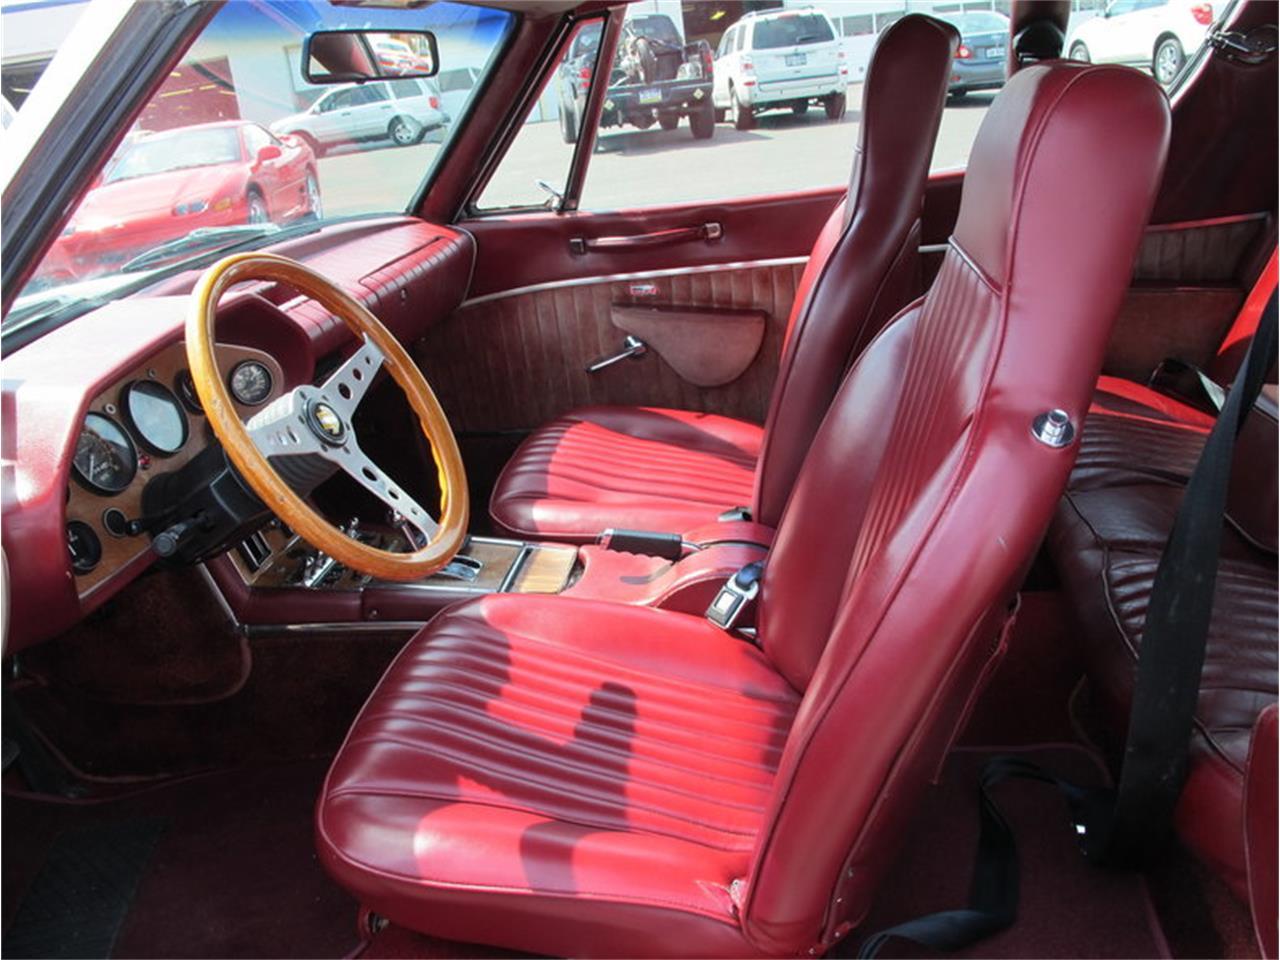 1982 Studebaker Avanti For Sale Classiccars Com Cc 1085251